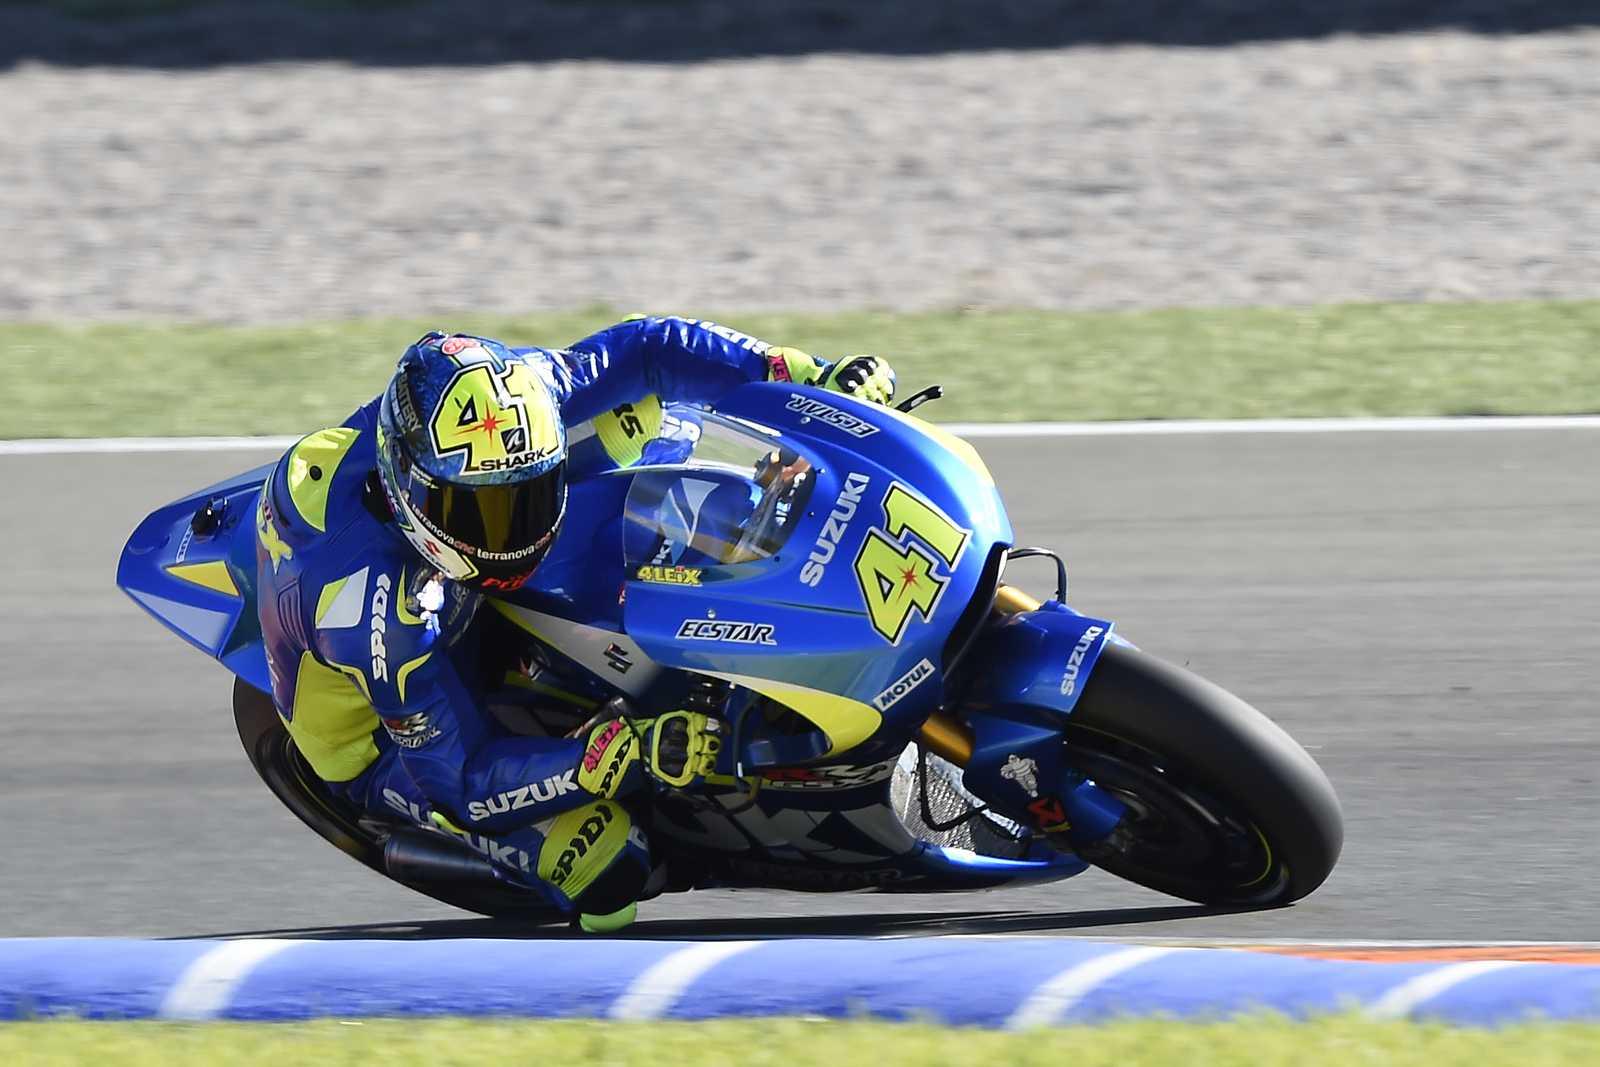 Aleix Espargaro of Spain and Team Suzuki MotoGP rounds the bend News Photo - Getty Images